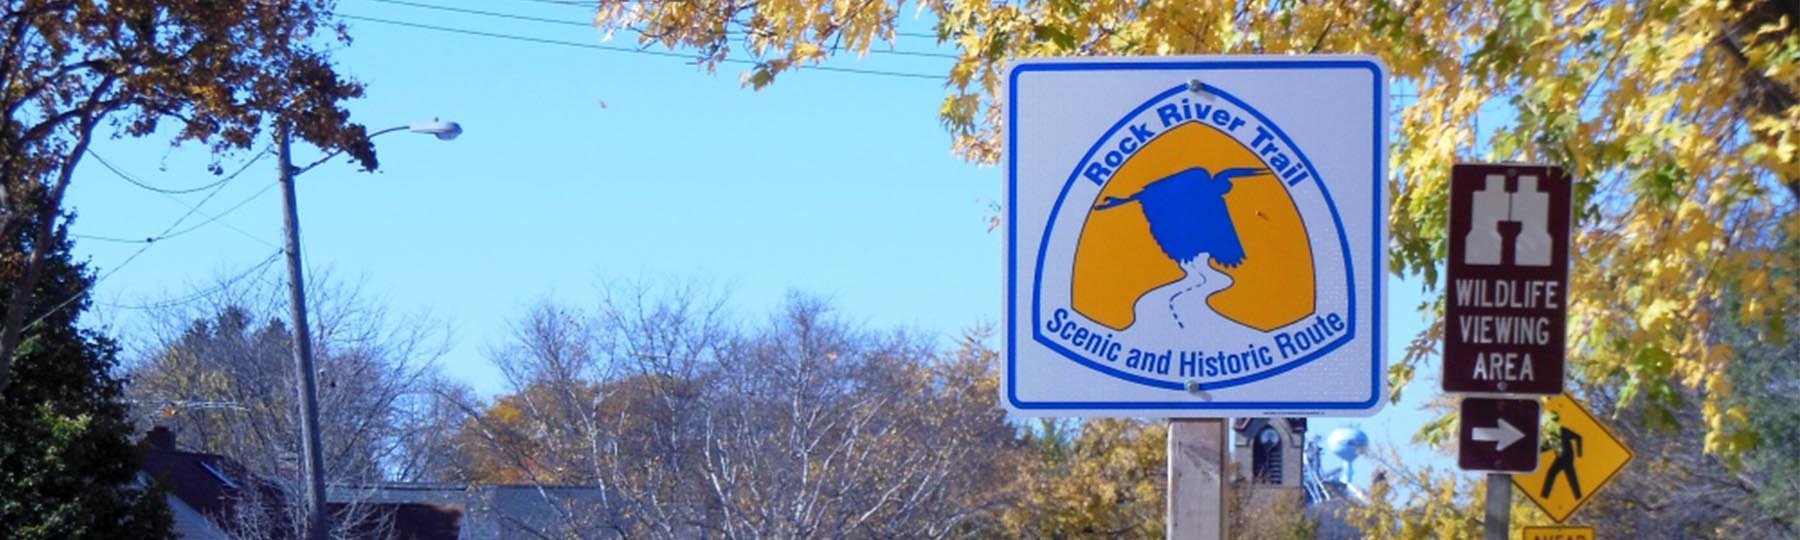 Rock River Trail Scenic and Historic Route Wisconsin Illinois